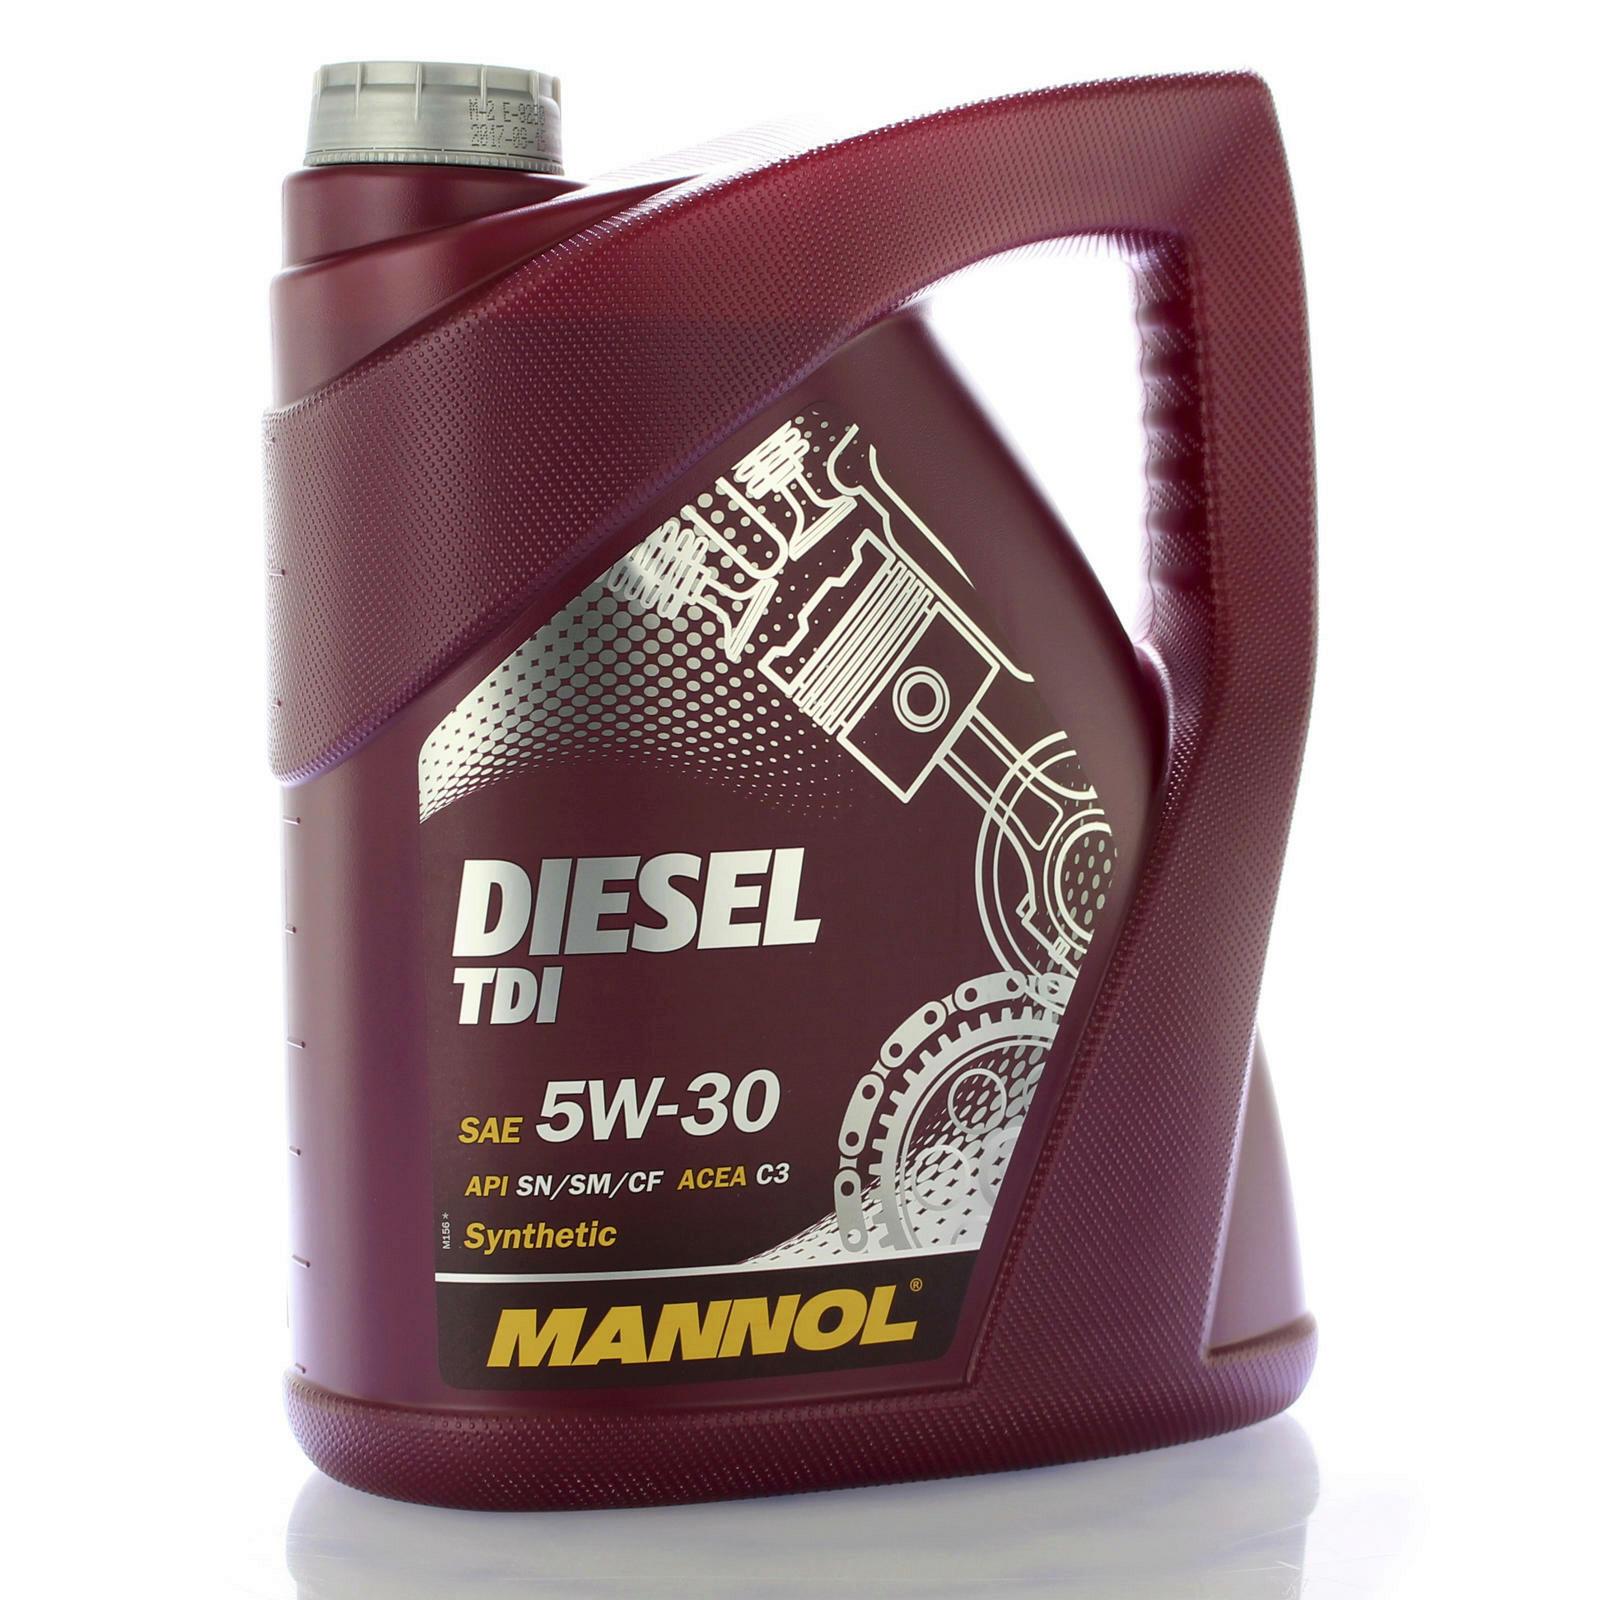 mannol motor l diesel tdi 5w 30 5l lott autoteile. Black Bedroom Furniture Sets. Home Design Ideas